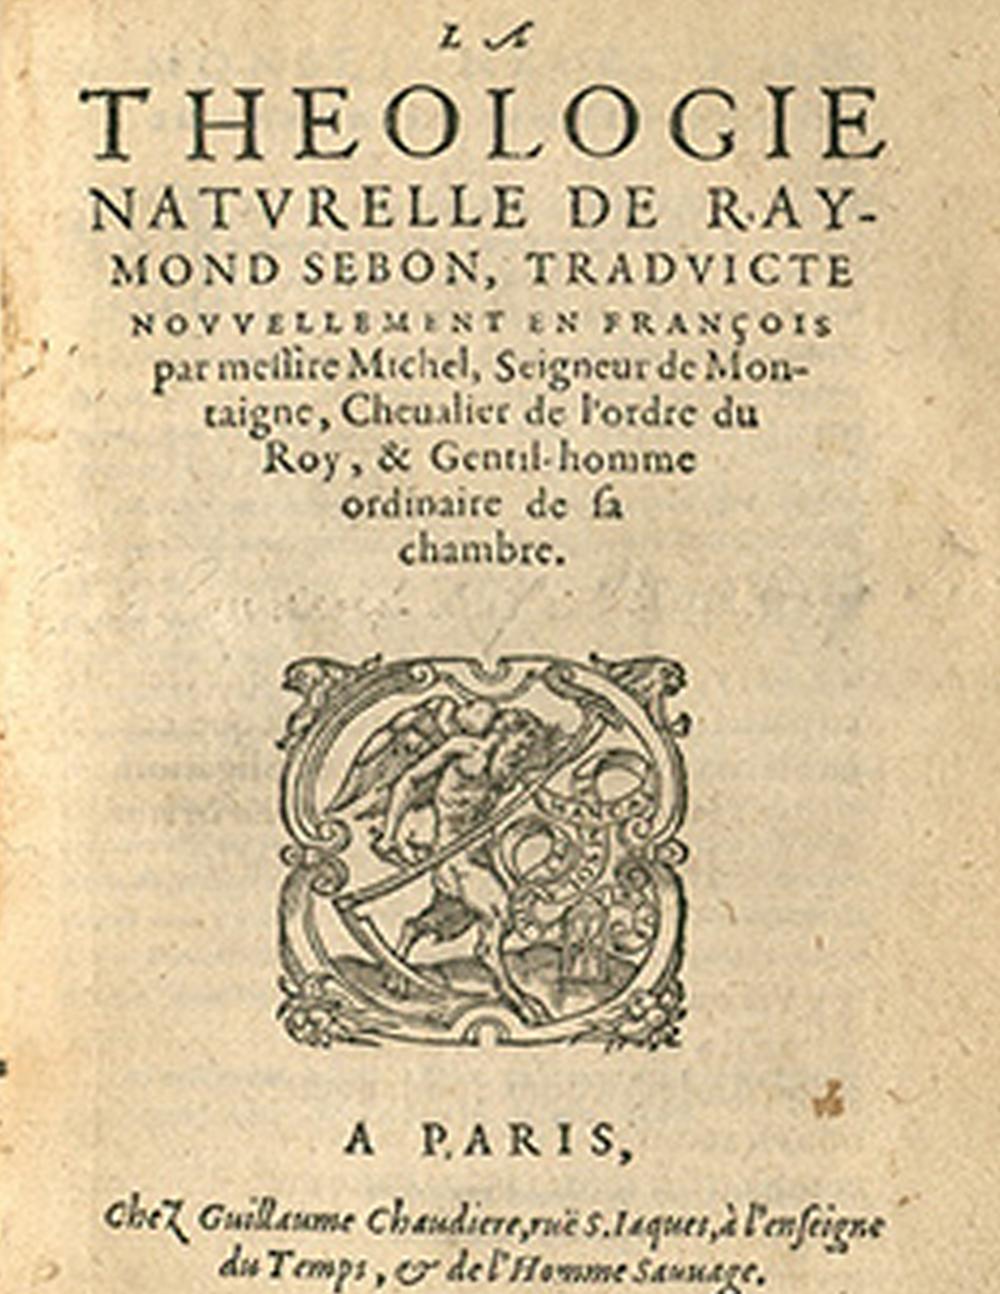 From Ramon Sabunde,  La Theologie Naturelle translated by Michel de Montaigne (Paris, 1581).  Courtesy  Les Bibliothèques Virtuelles Humanistes   Appears on:  Writing